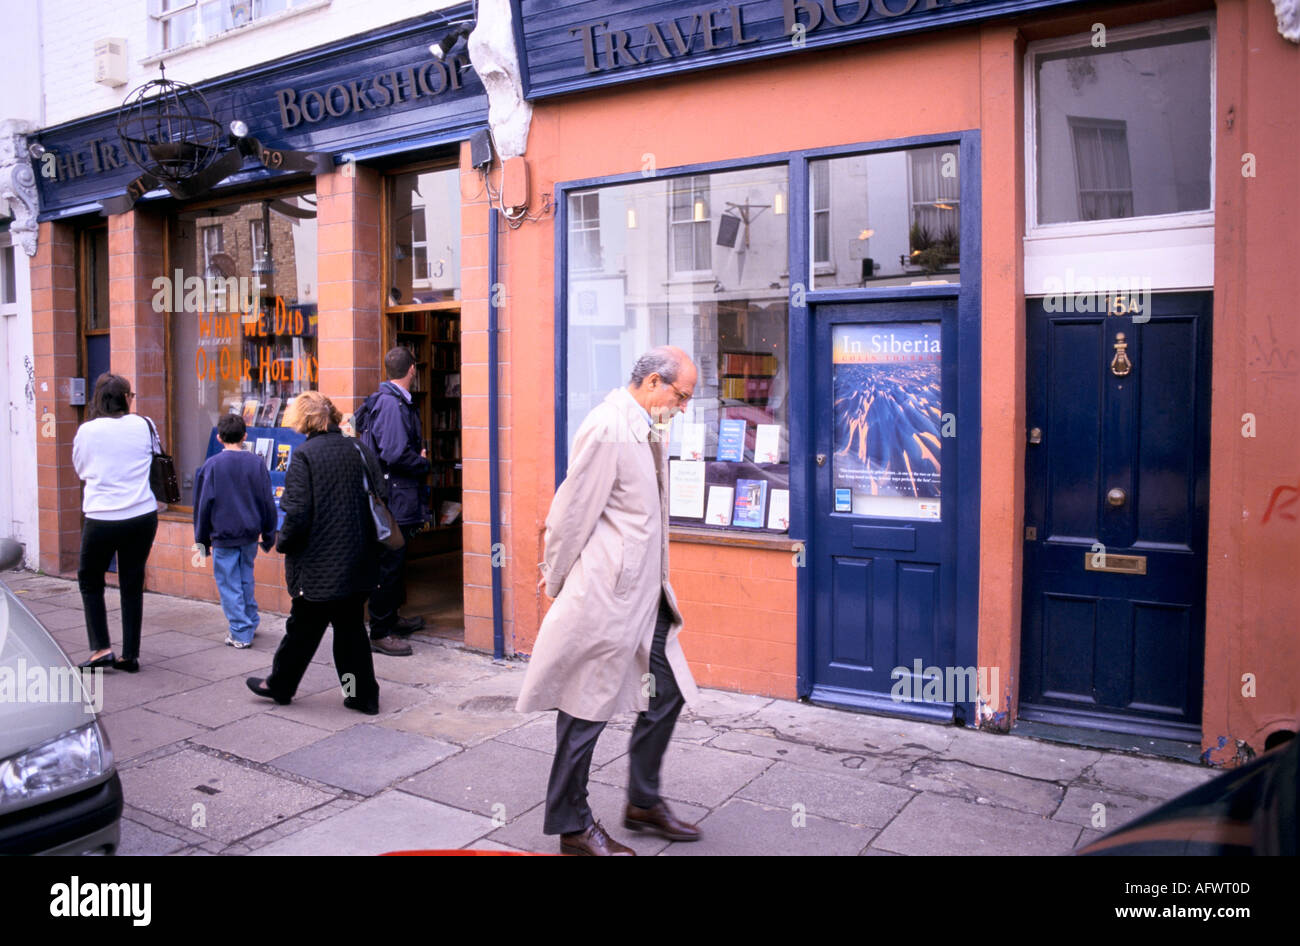 The 'Travel Bookshop' Notting Hill Gate west London 13 Blenheim Crescent . Made famous in Hugh Grant film. HOMER SYKES - Stock Image